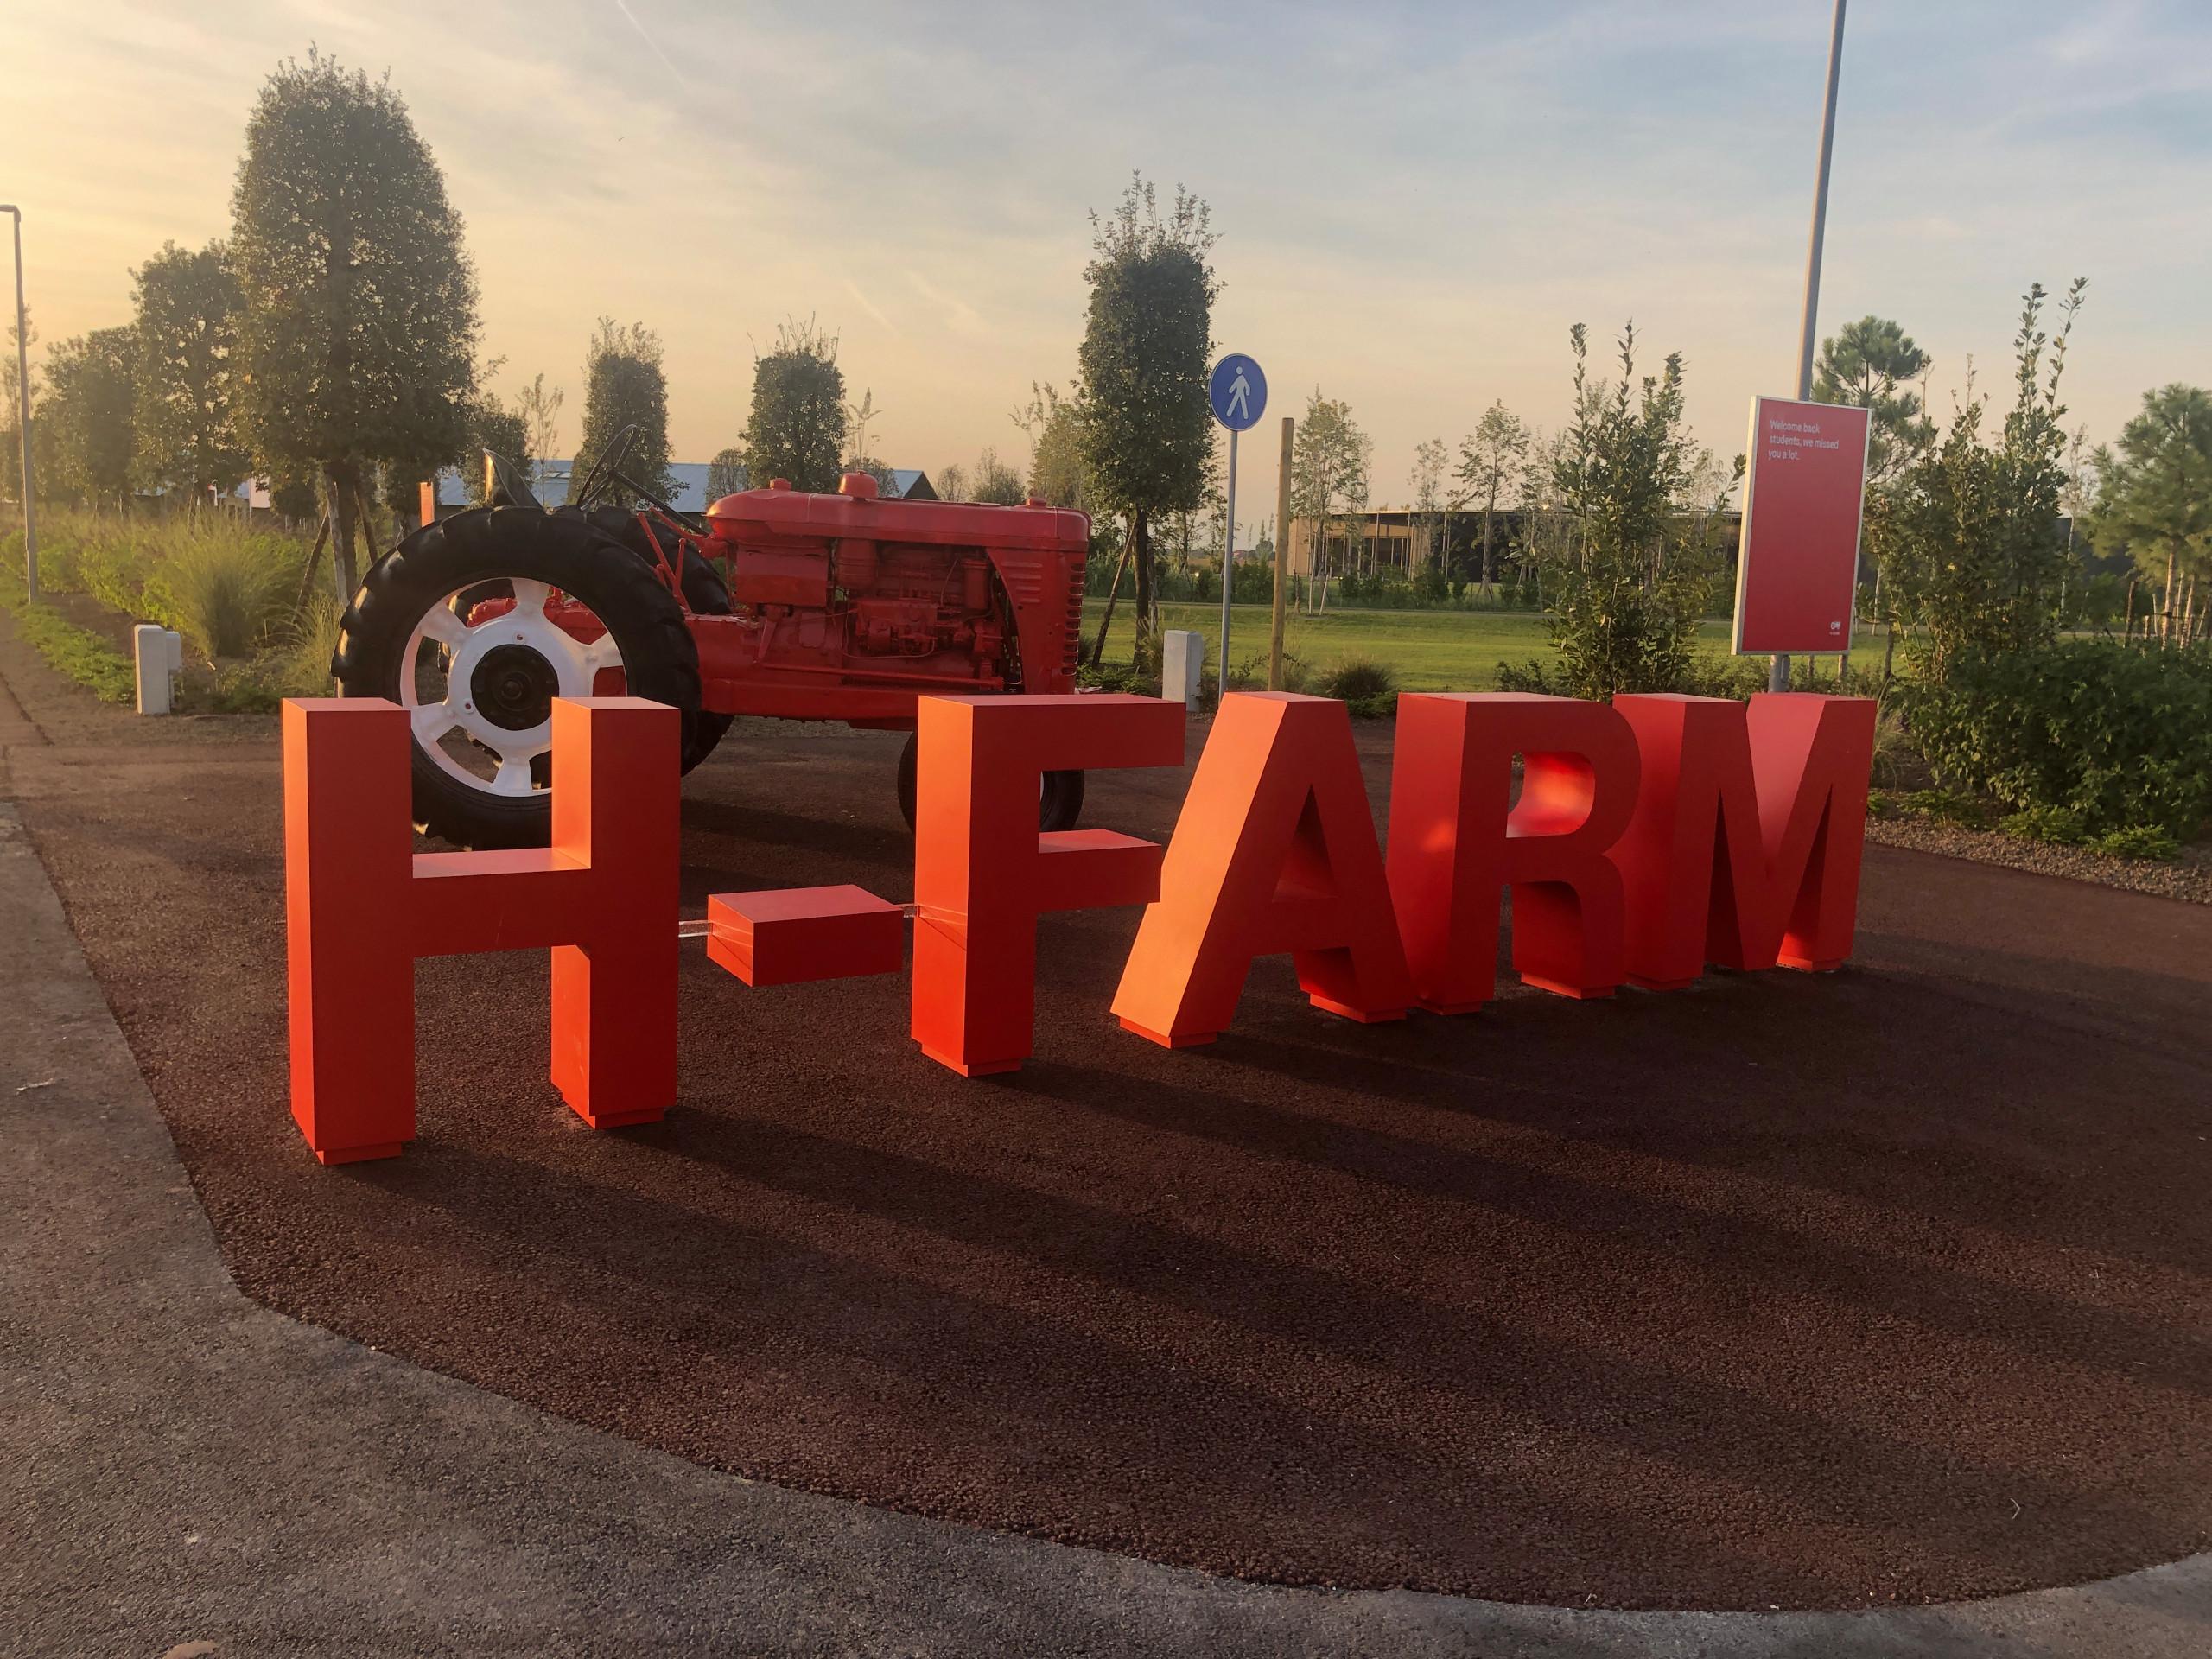 H-Farm campus